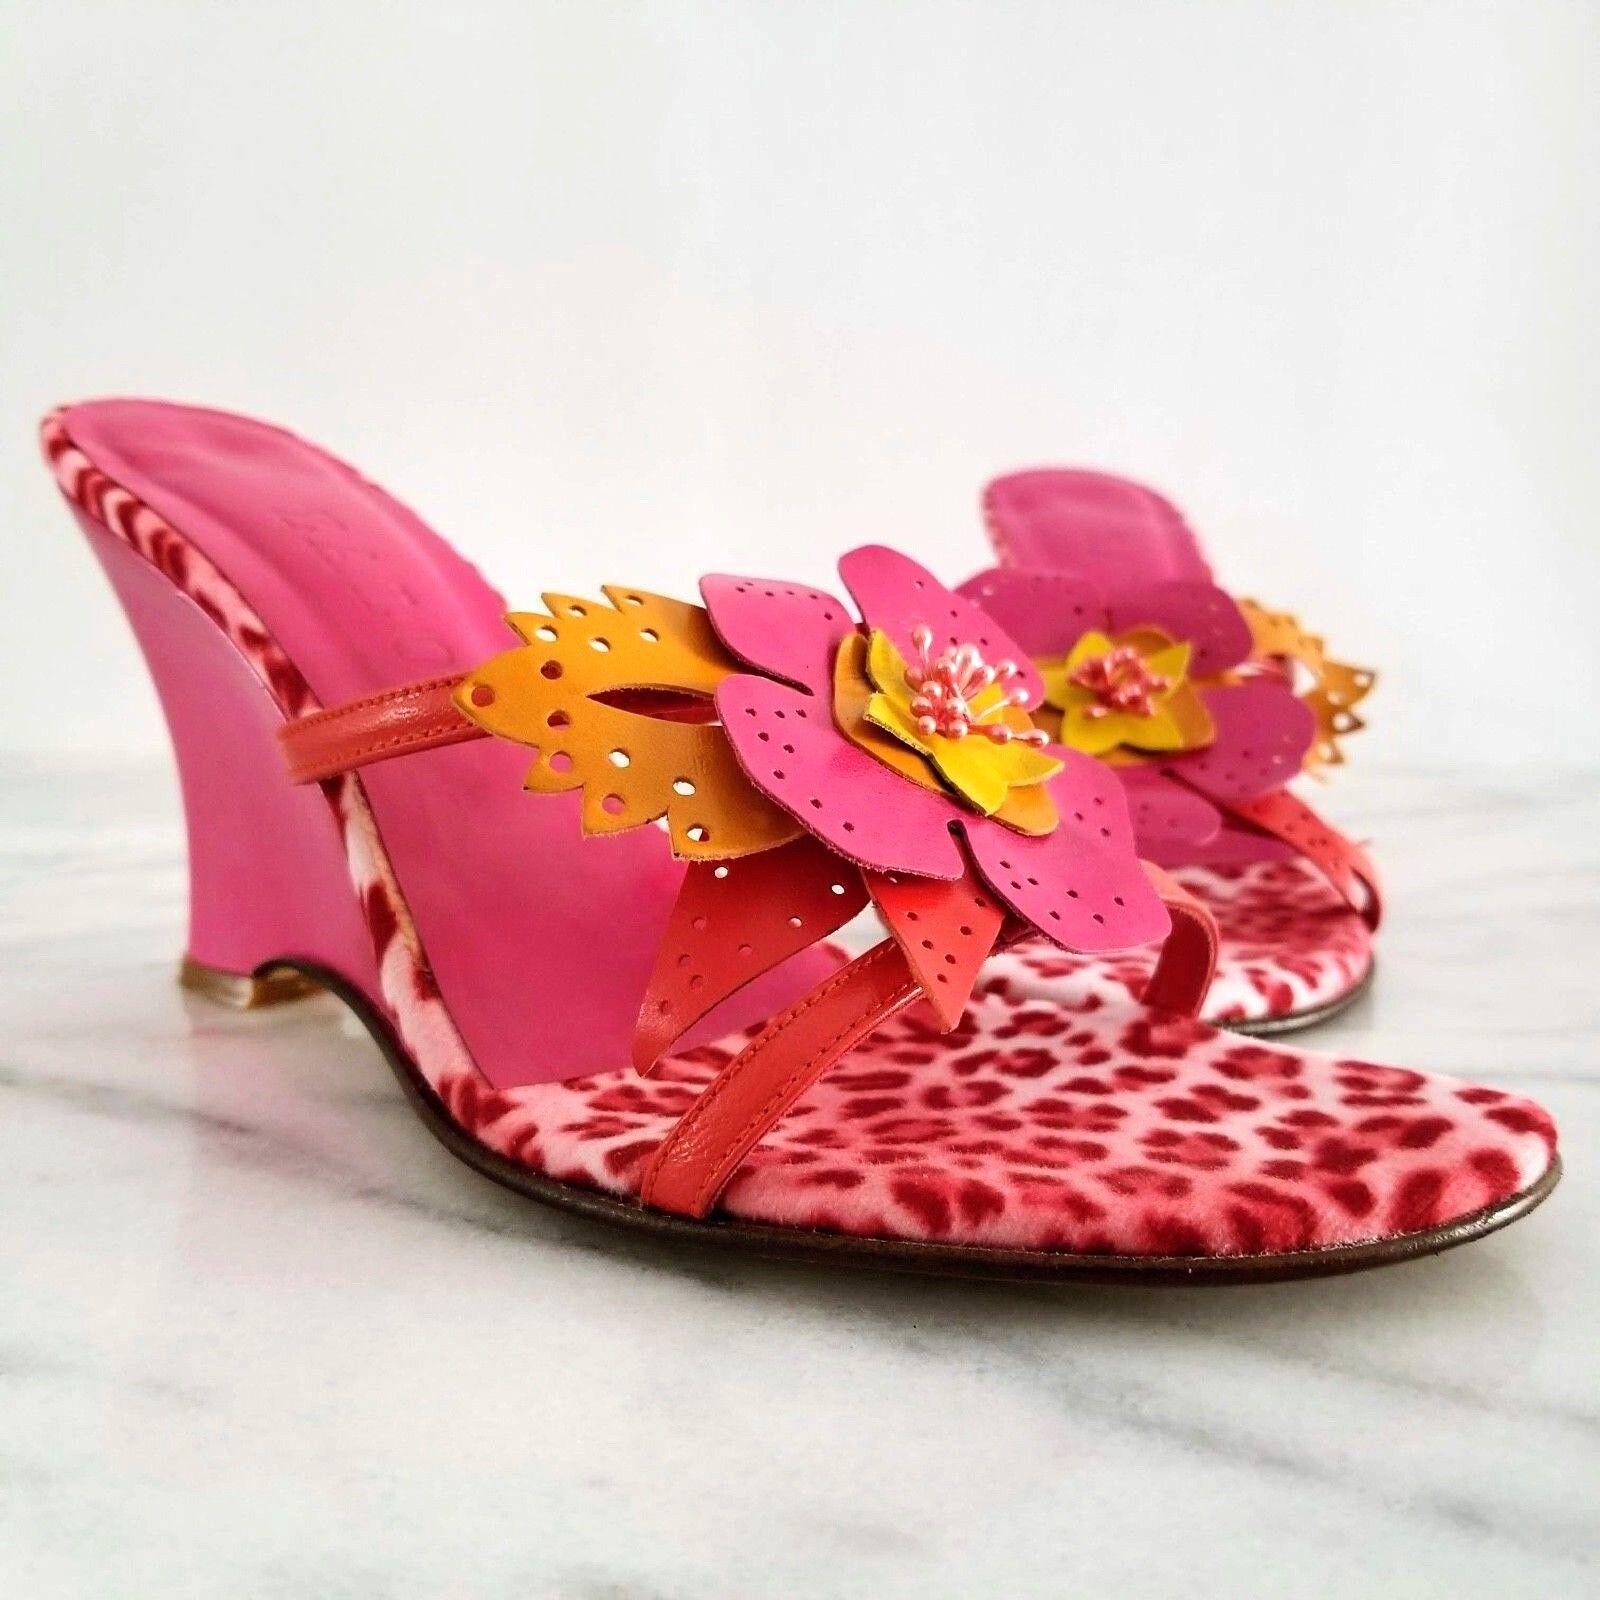 ZALO Spain Women's Wedge Sandal Pink Leather Flower Embellished Floral shoes 7.5